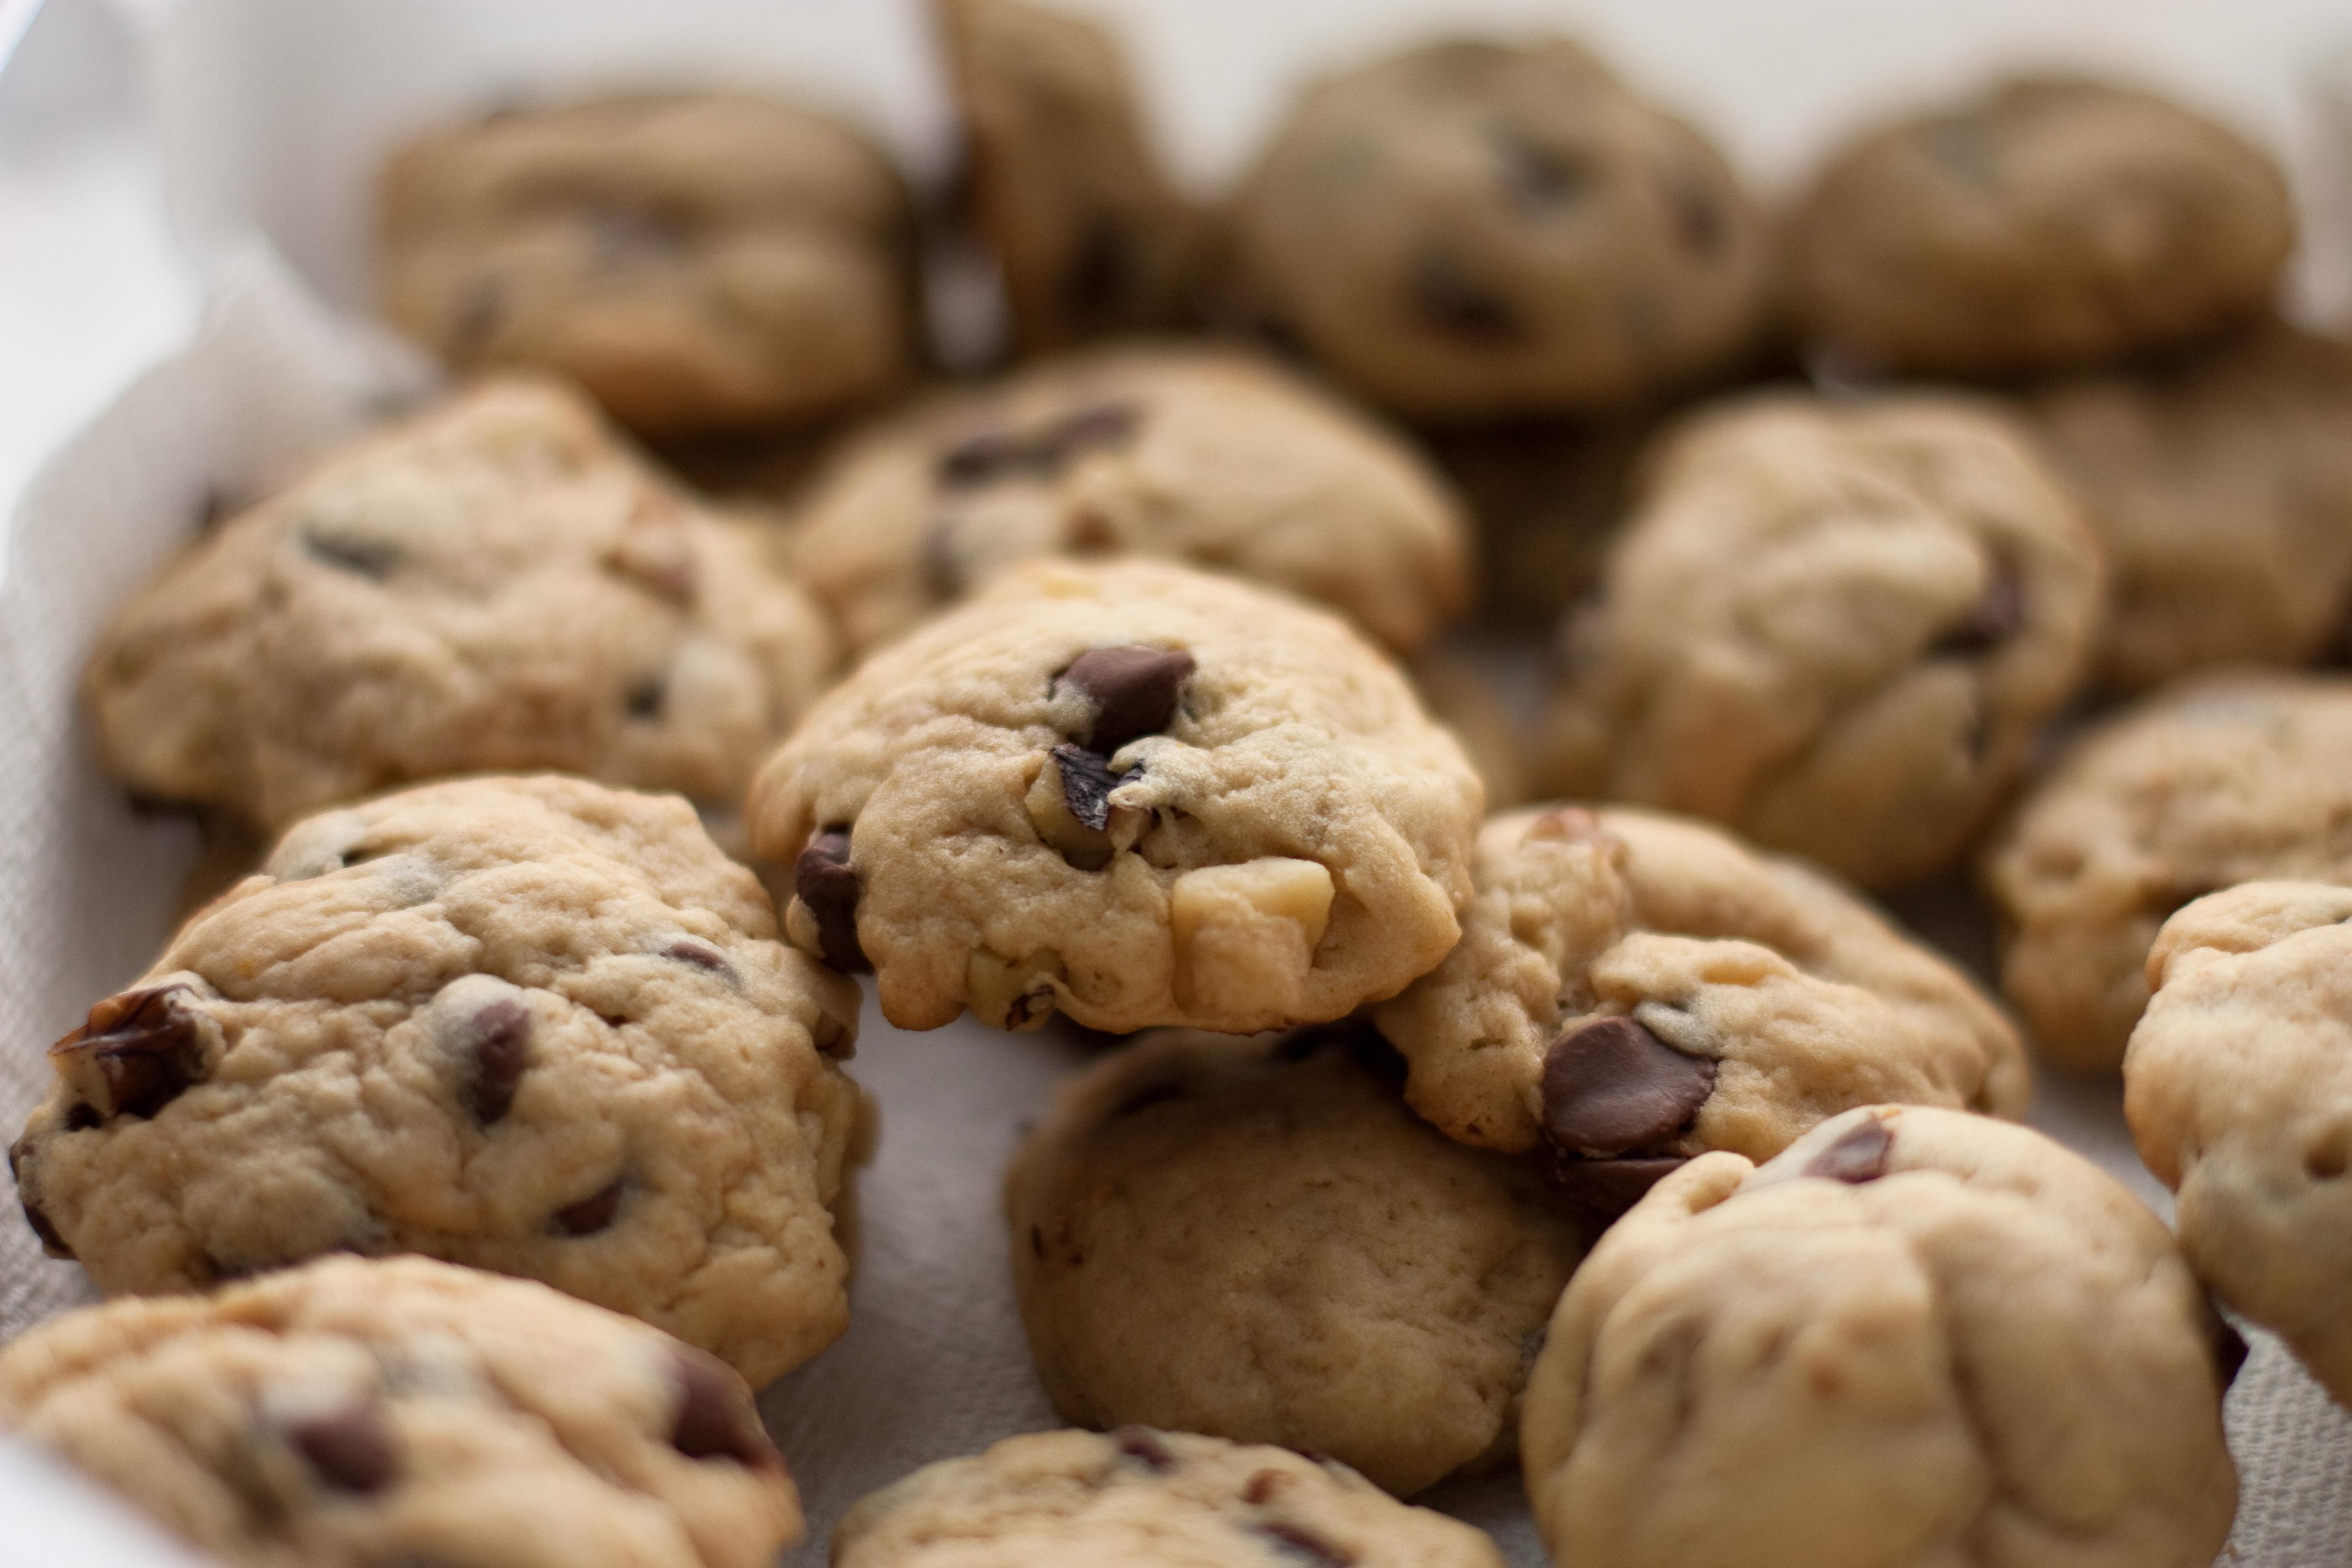 File:Walnut chocolate chip cookies, May 2009.jpg - Wikimedia Commons